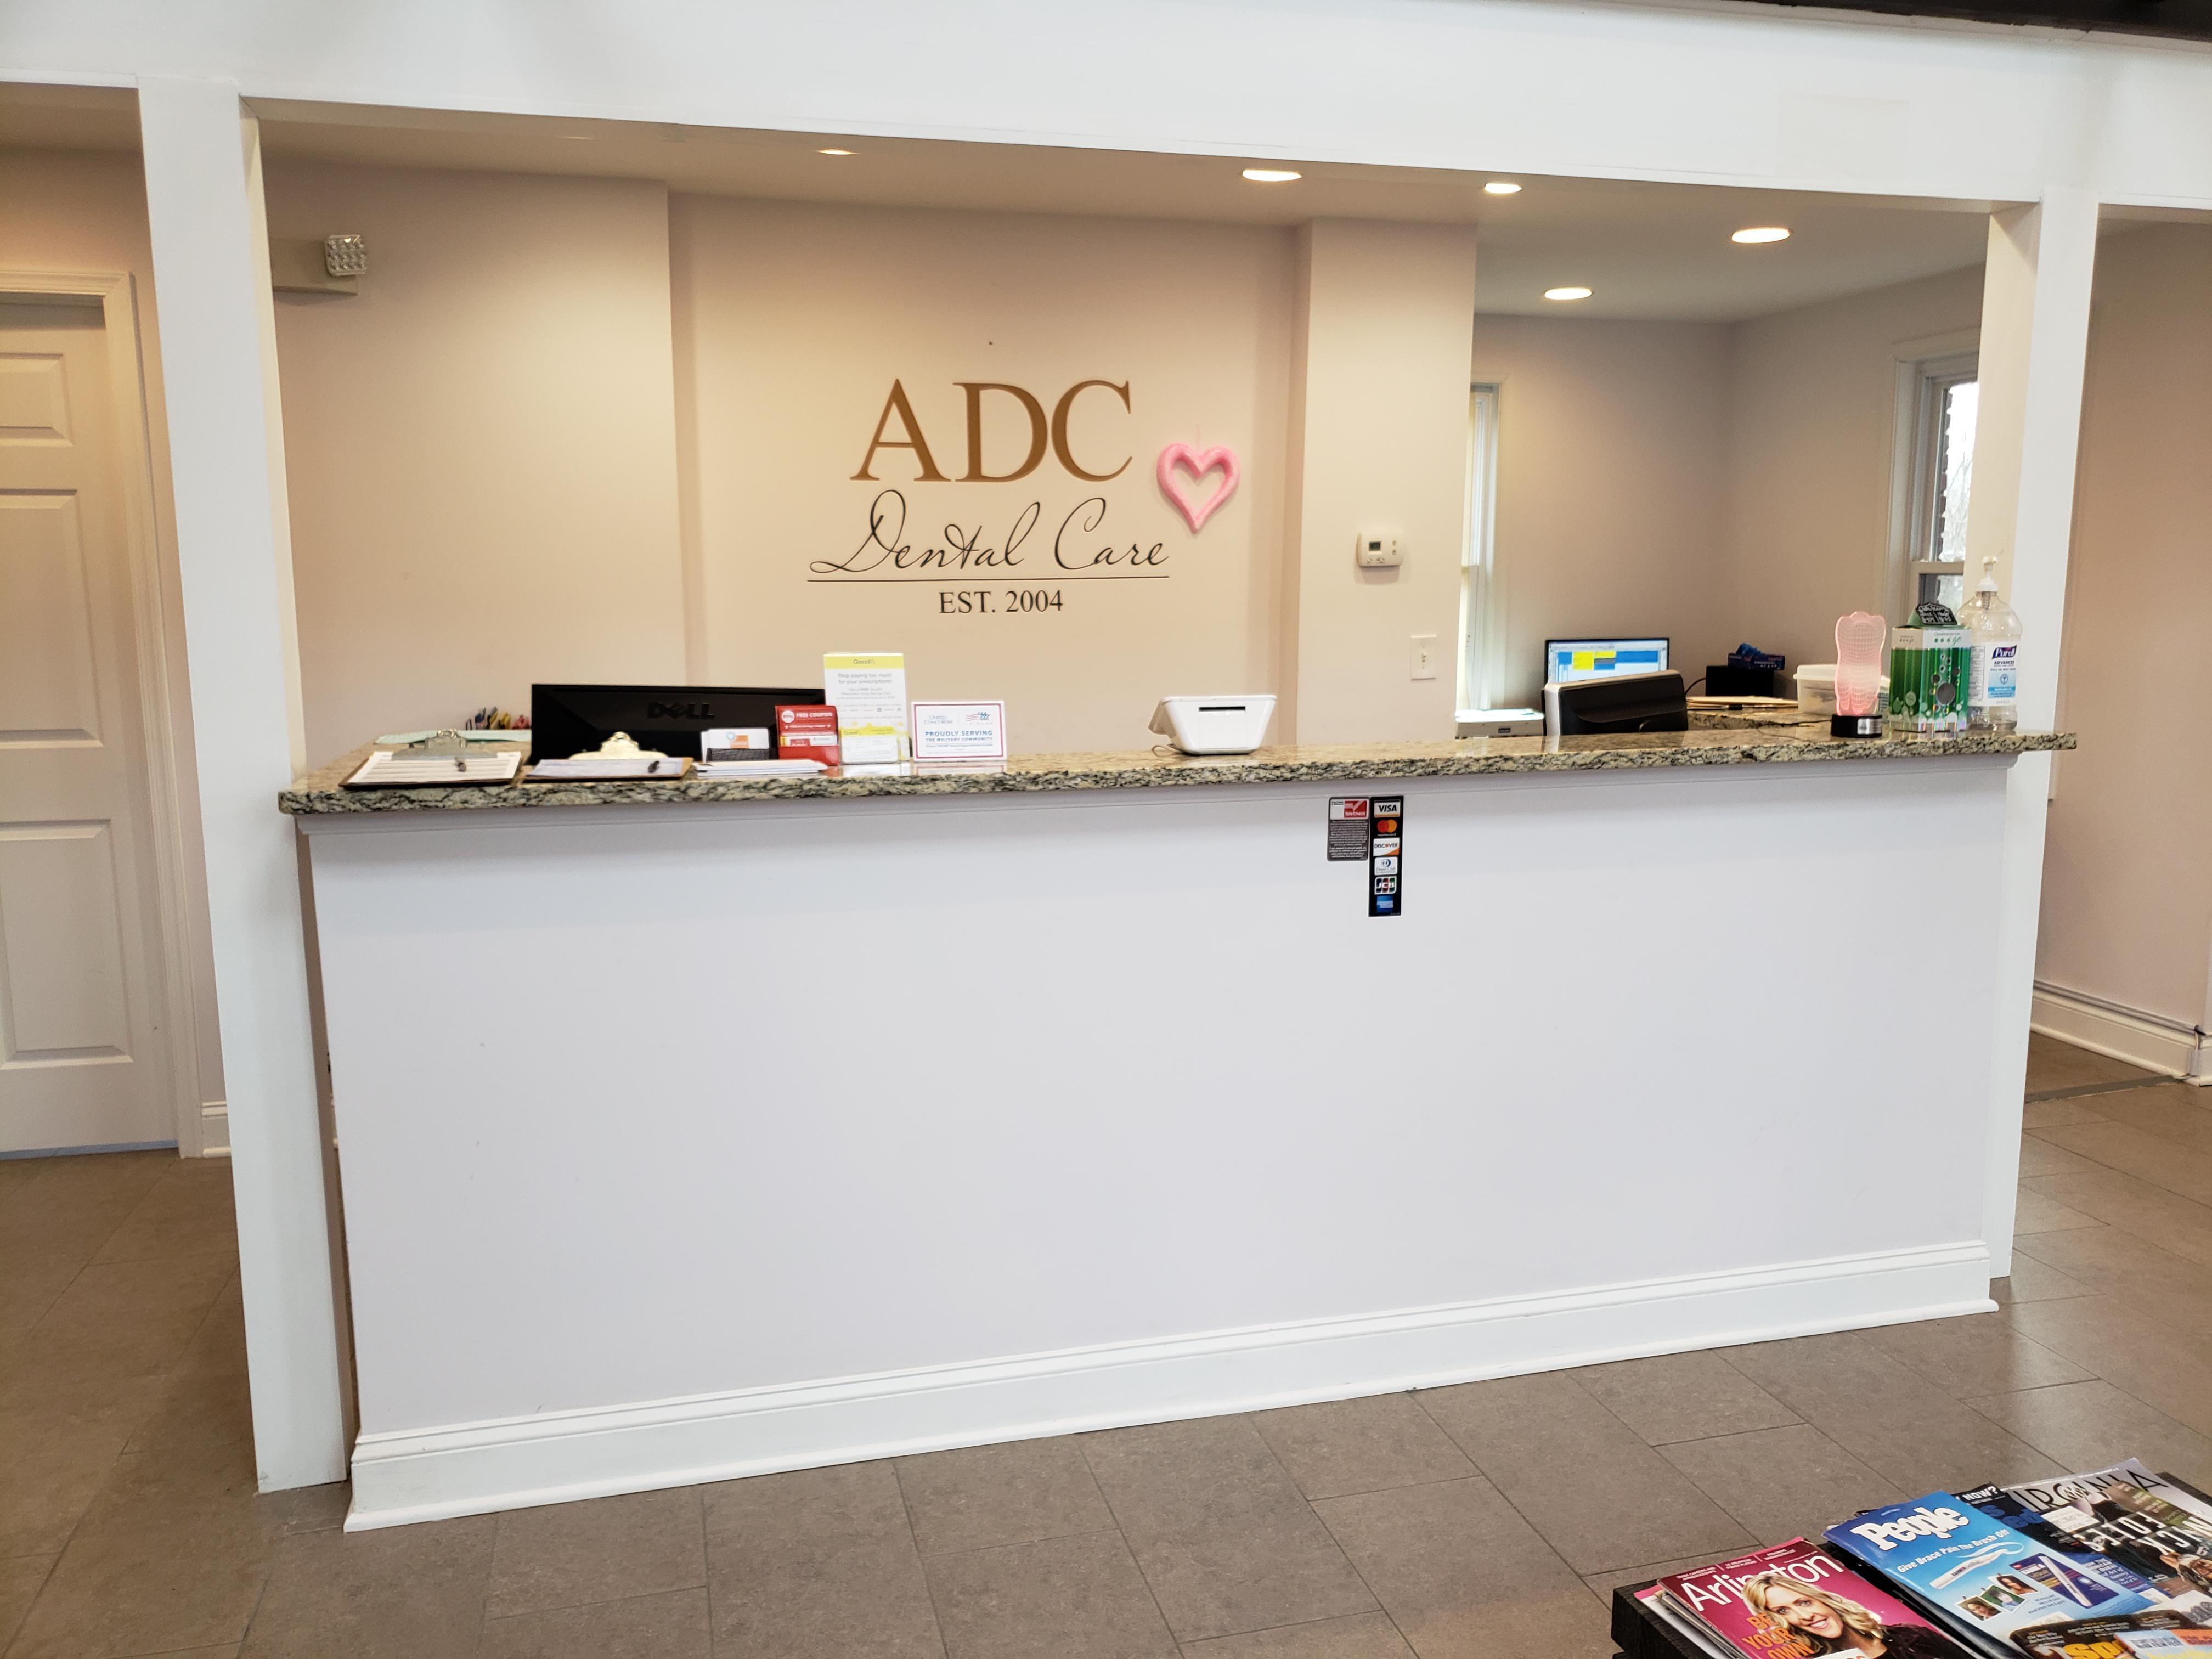 ADC Dentist image 1